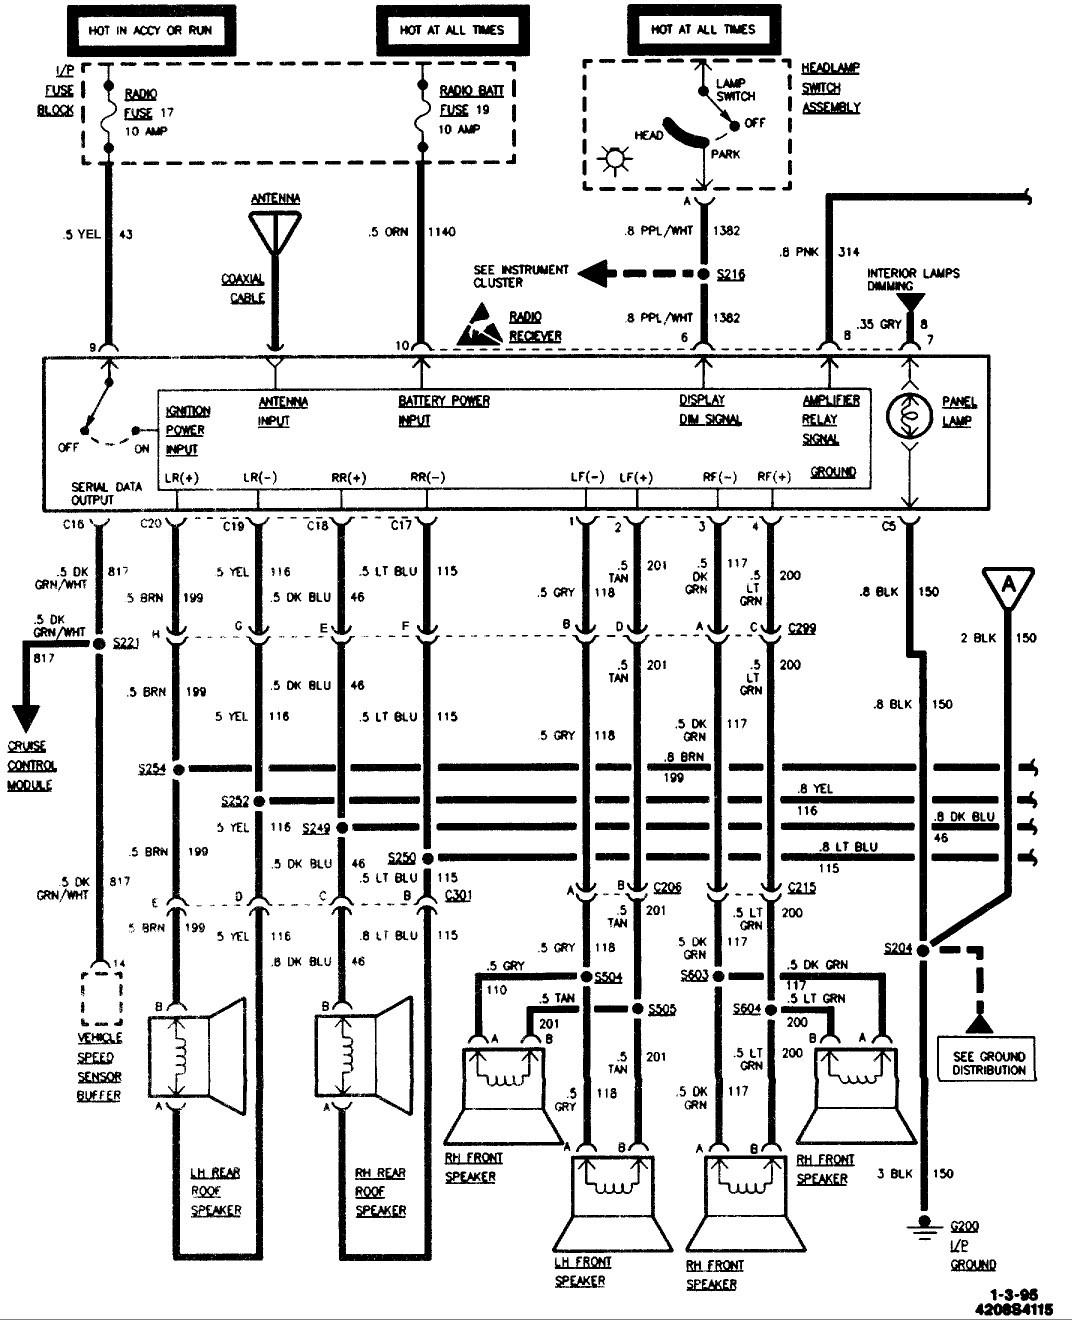 Amazing 1995 Corvette Wiring Diagram Basic Electronics Wiring Diagram Wiring Cloud Icalpermsplehendilmohammedshrineorg